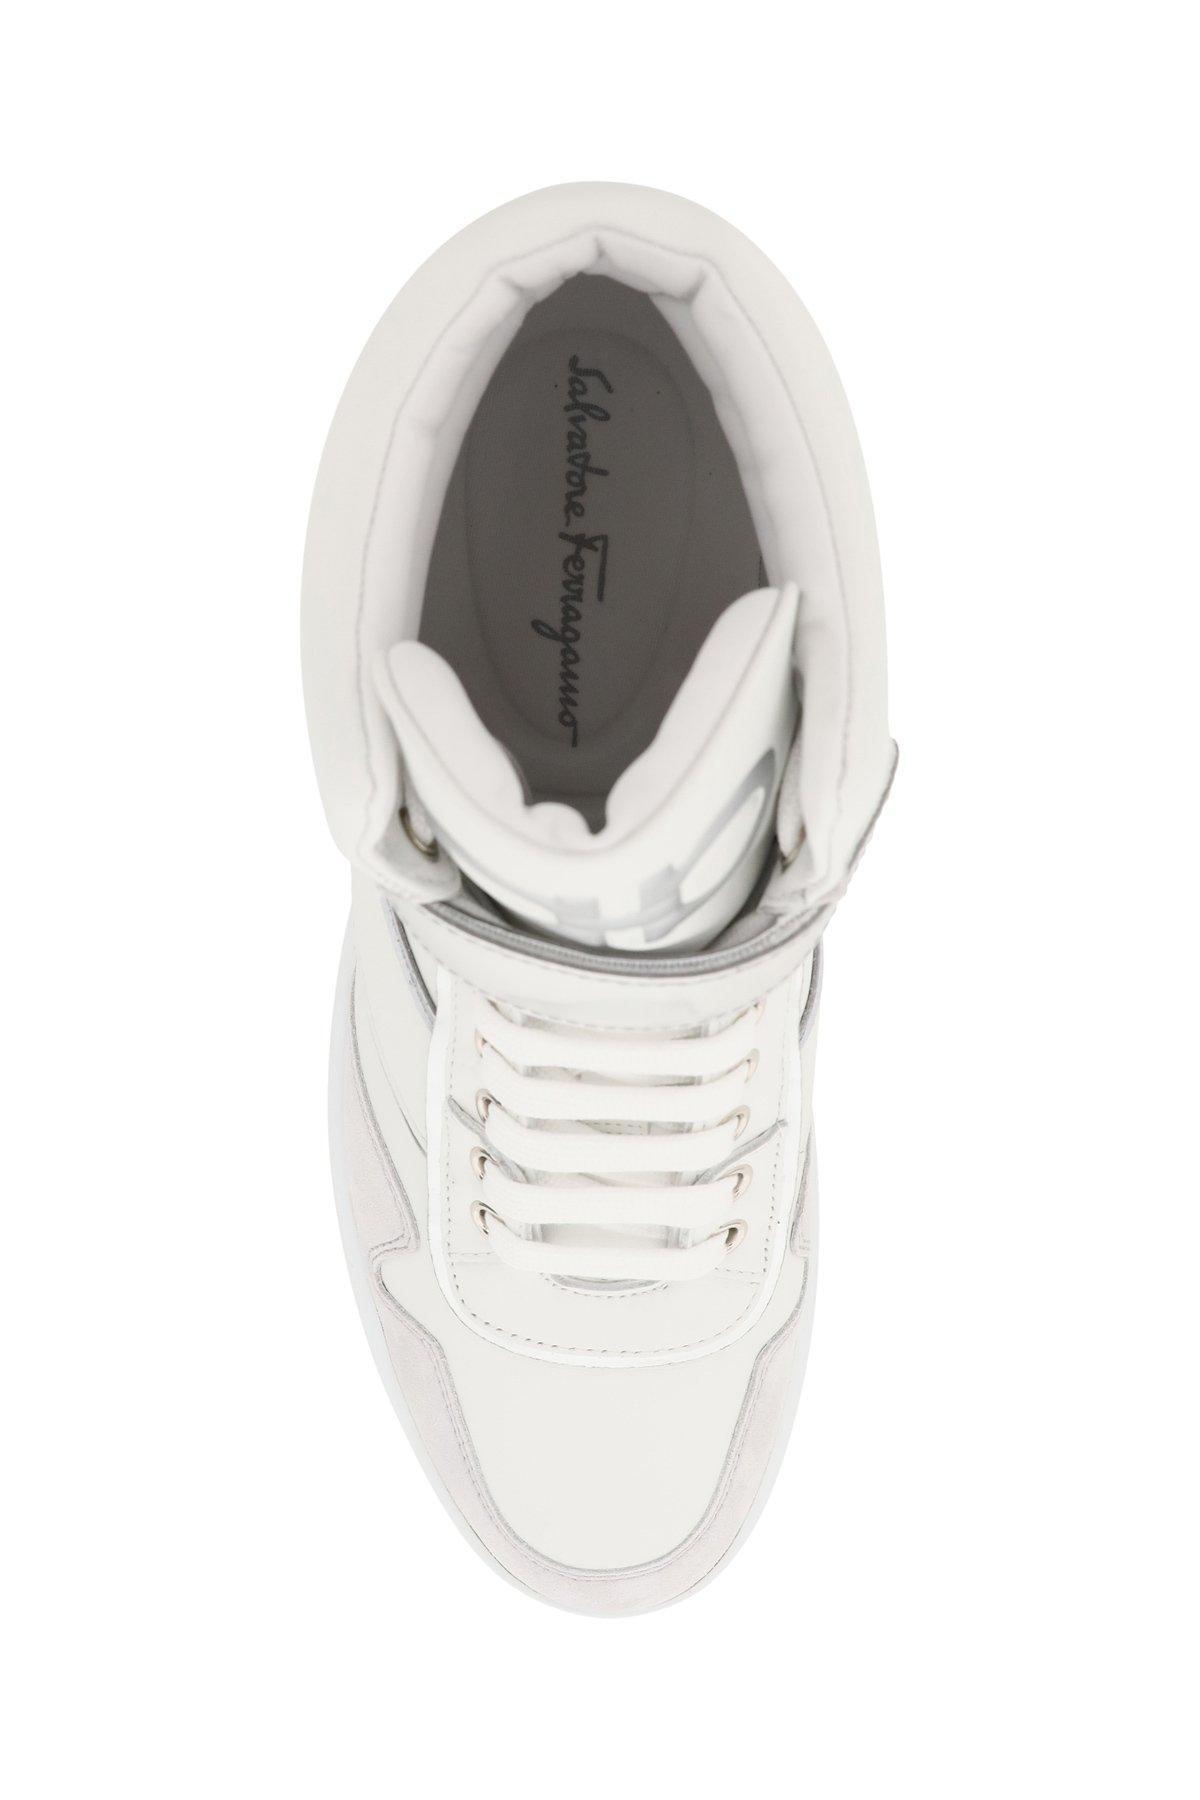 Salvatore ferragamo sneakers alte gancini